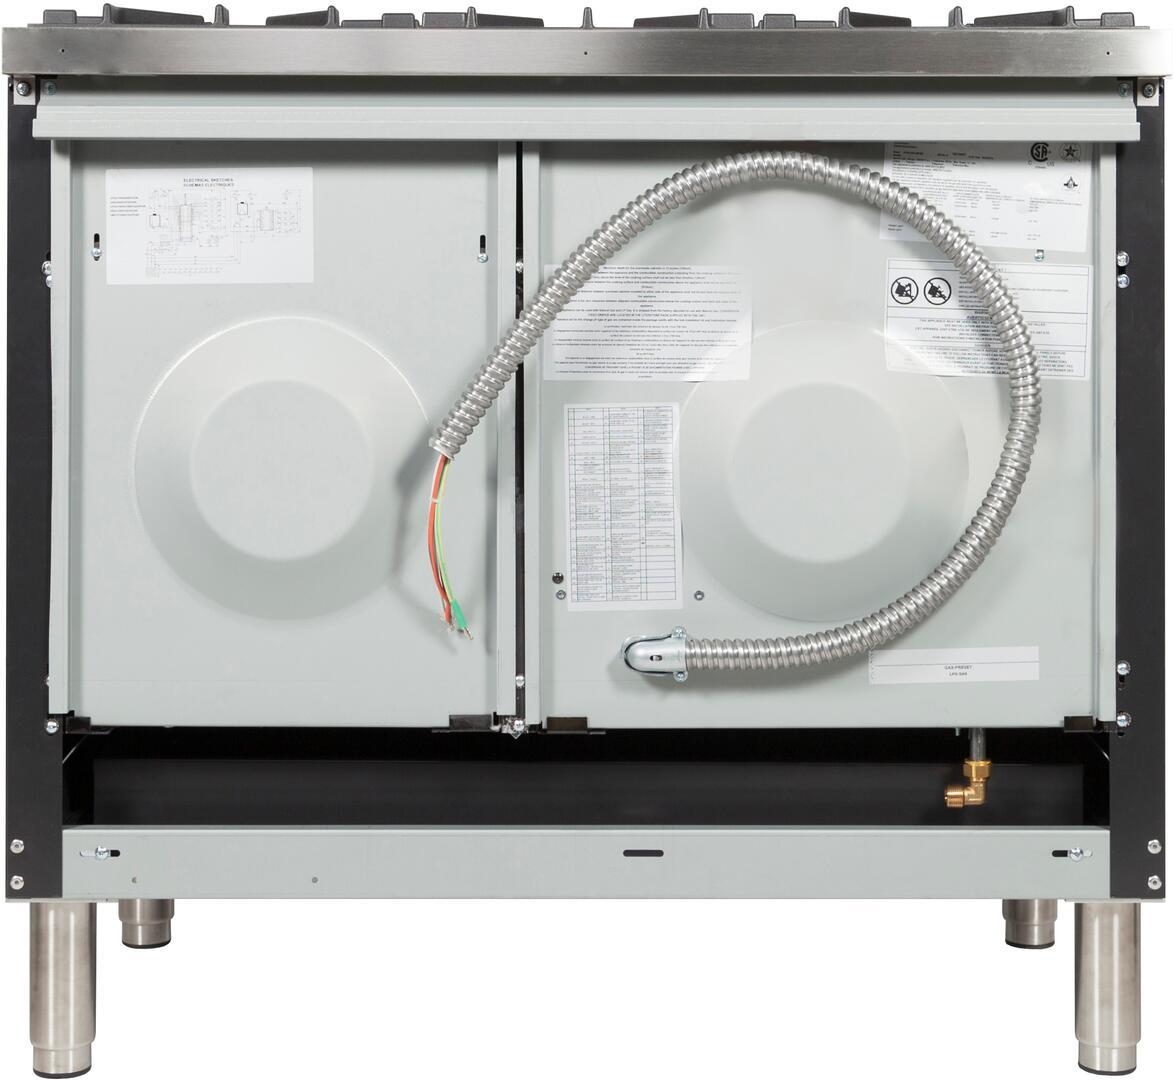 Ilve Nostalgie UPDN100FDMPMY Freestanding Dual Fuel Range Slate, UPDN100FDMPMY Back View